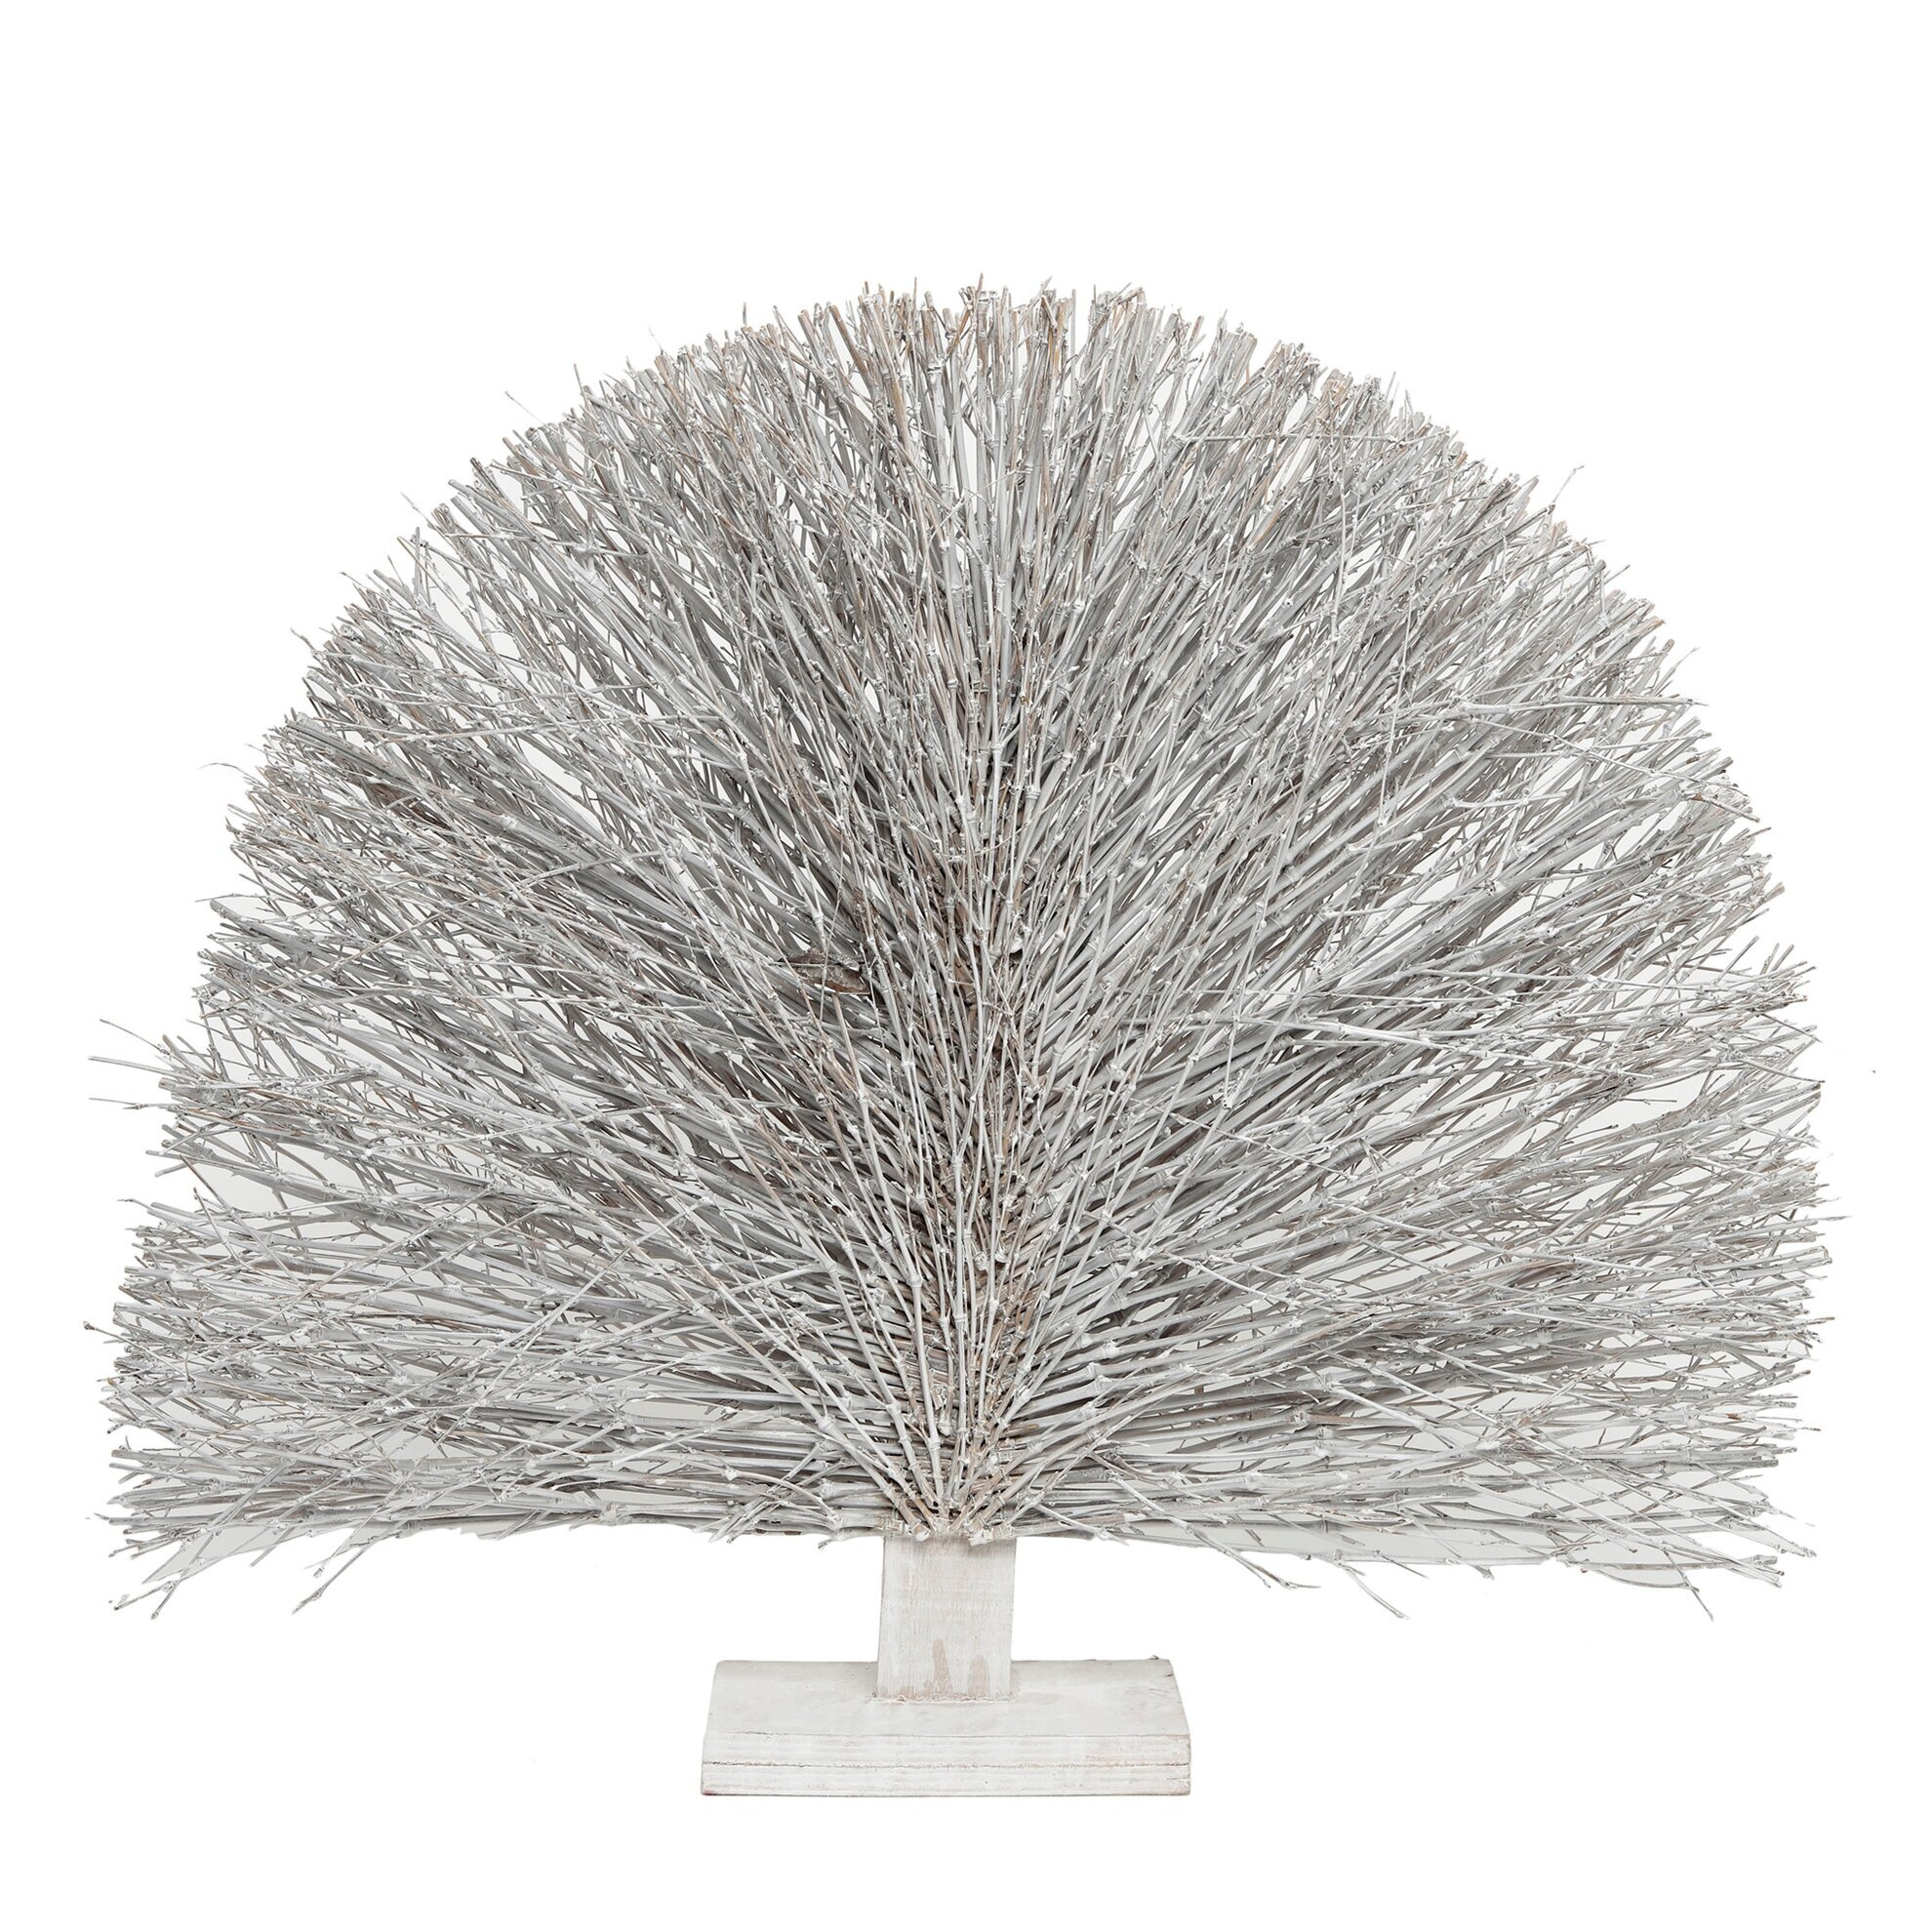 Dekoratif Obje - Bambu Dalları (9x75x70cm)